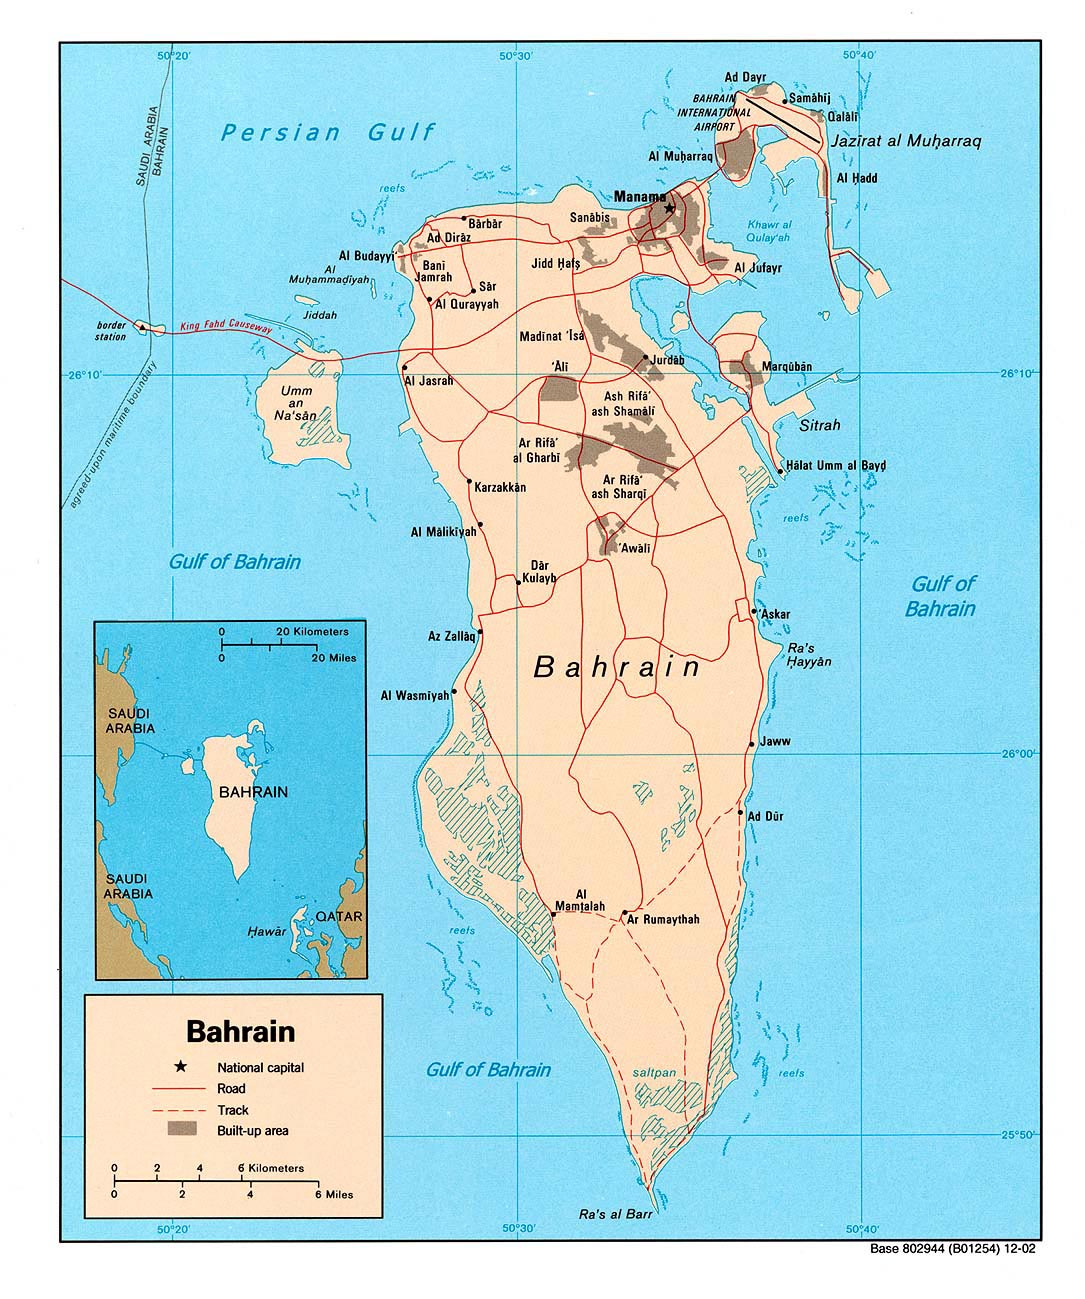 bahrain road map download Bahrain Maps Printable Maps Of Bahrain For Download bahrain road map download